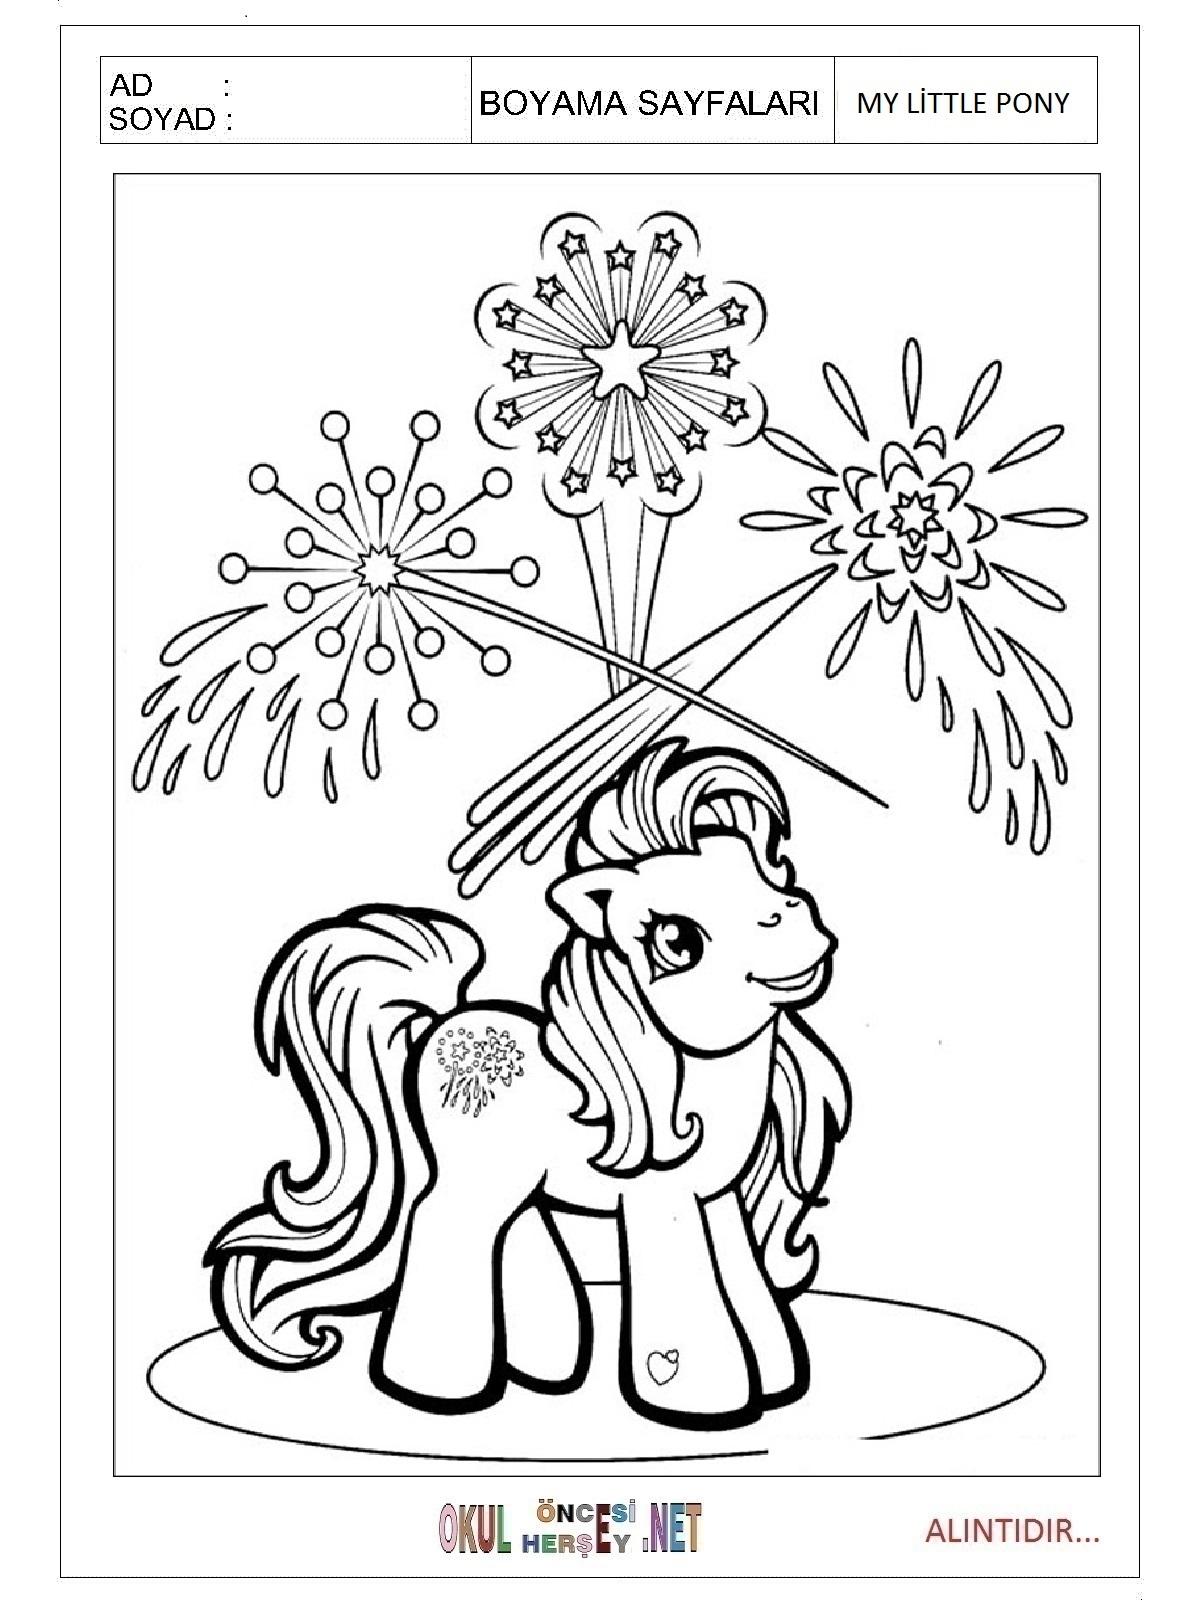 My Little Pony Boyama Sayfalari